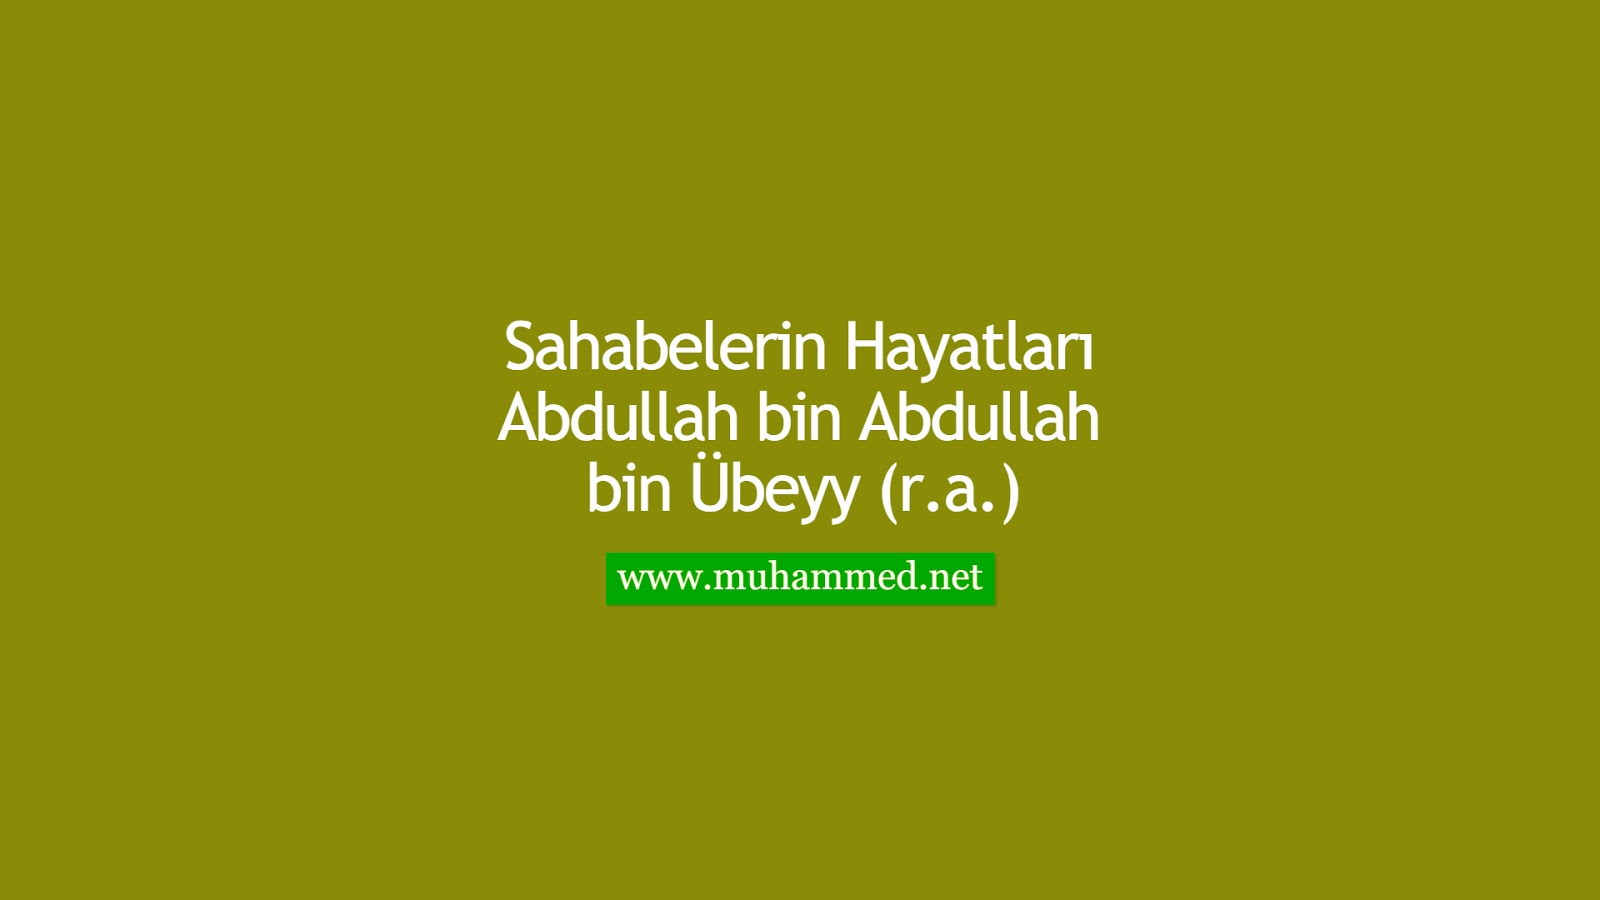 Abdullah bin Abdullah bin Übeyy (r.a.)